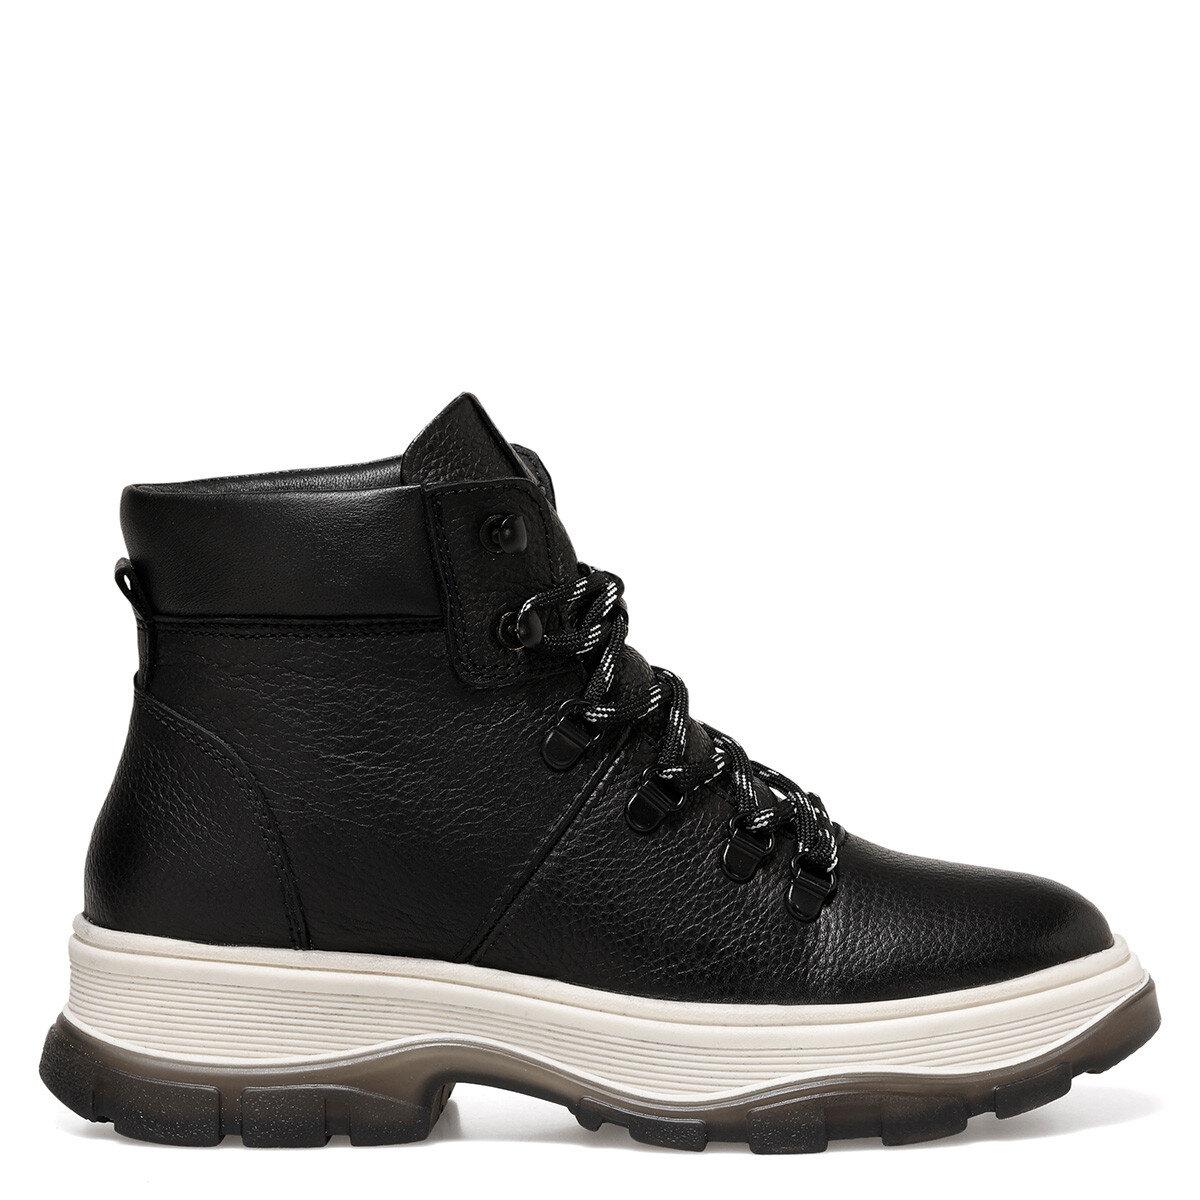 KIM Siyah Kadın Sneaker Bot